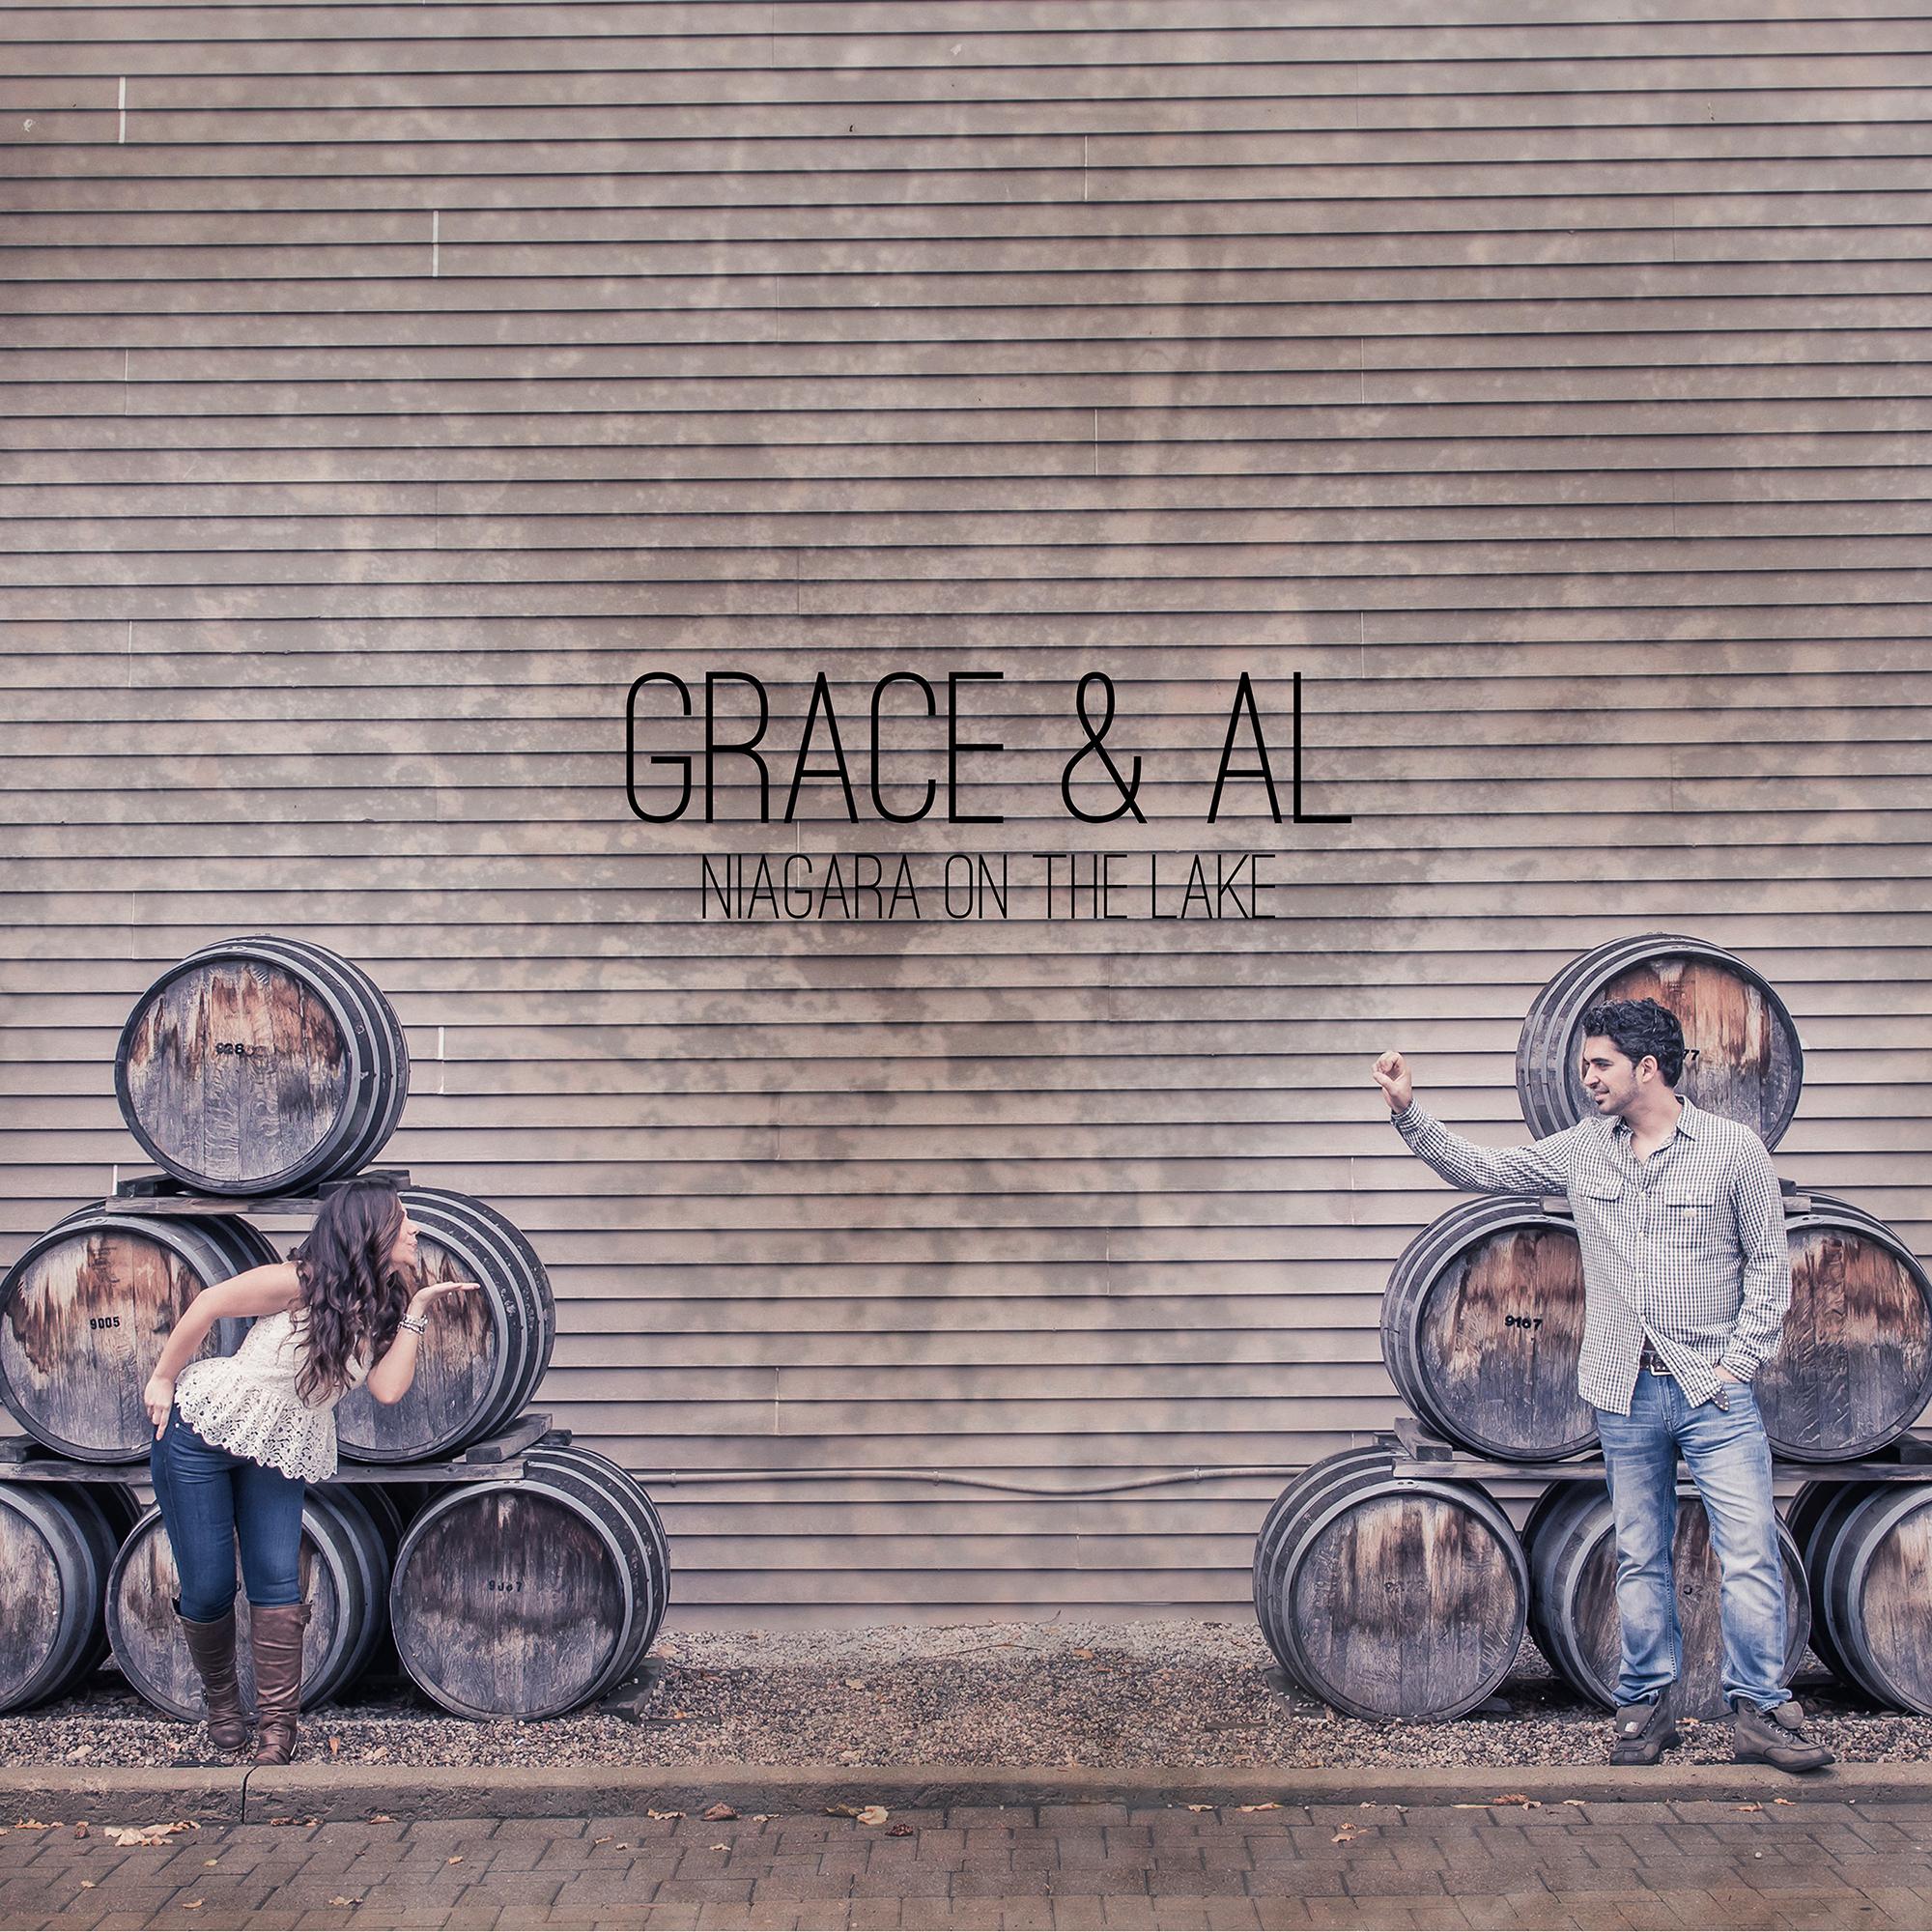 Grace and Al - web.jpg